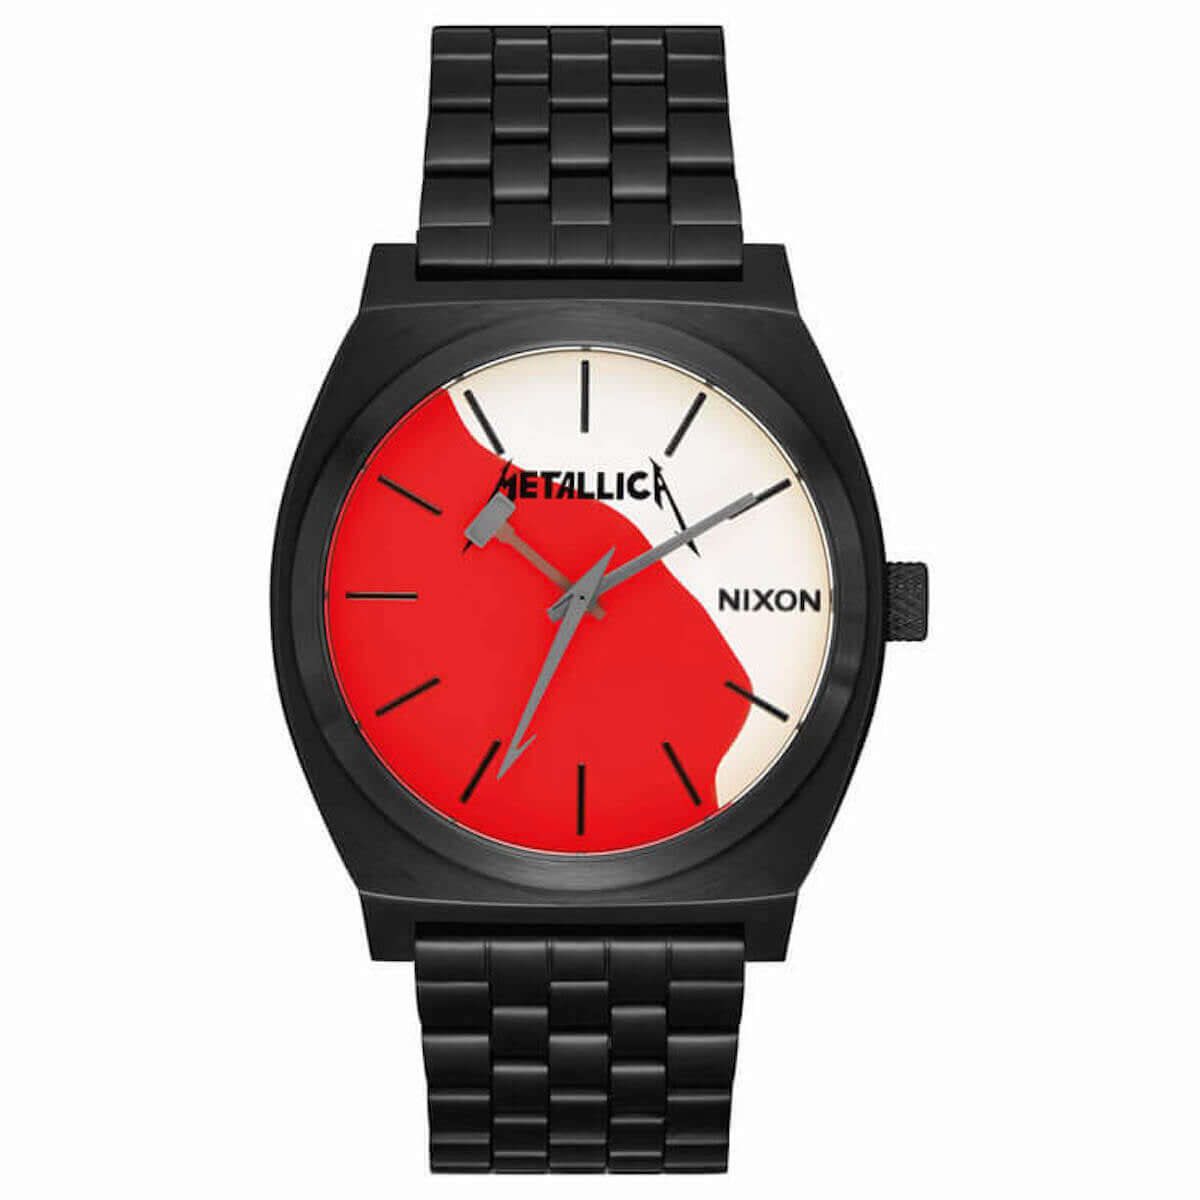 METALLICA X NIXON メタリカの名盤が腕時計に! music181112_nixon-metallica_3-1200x1200